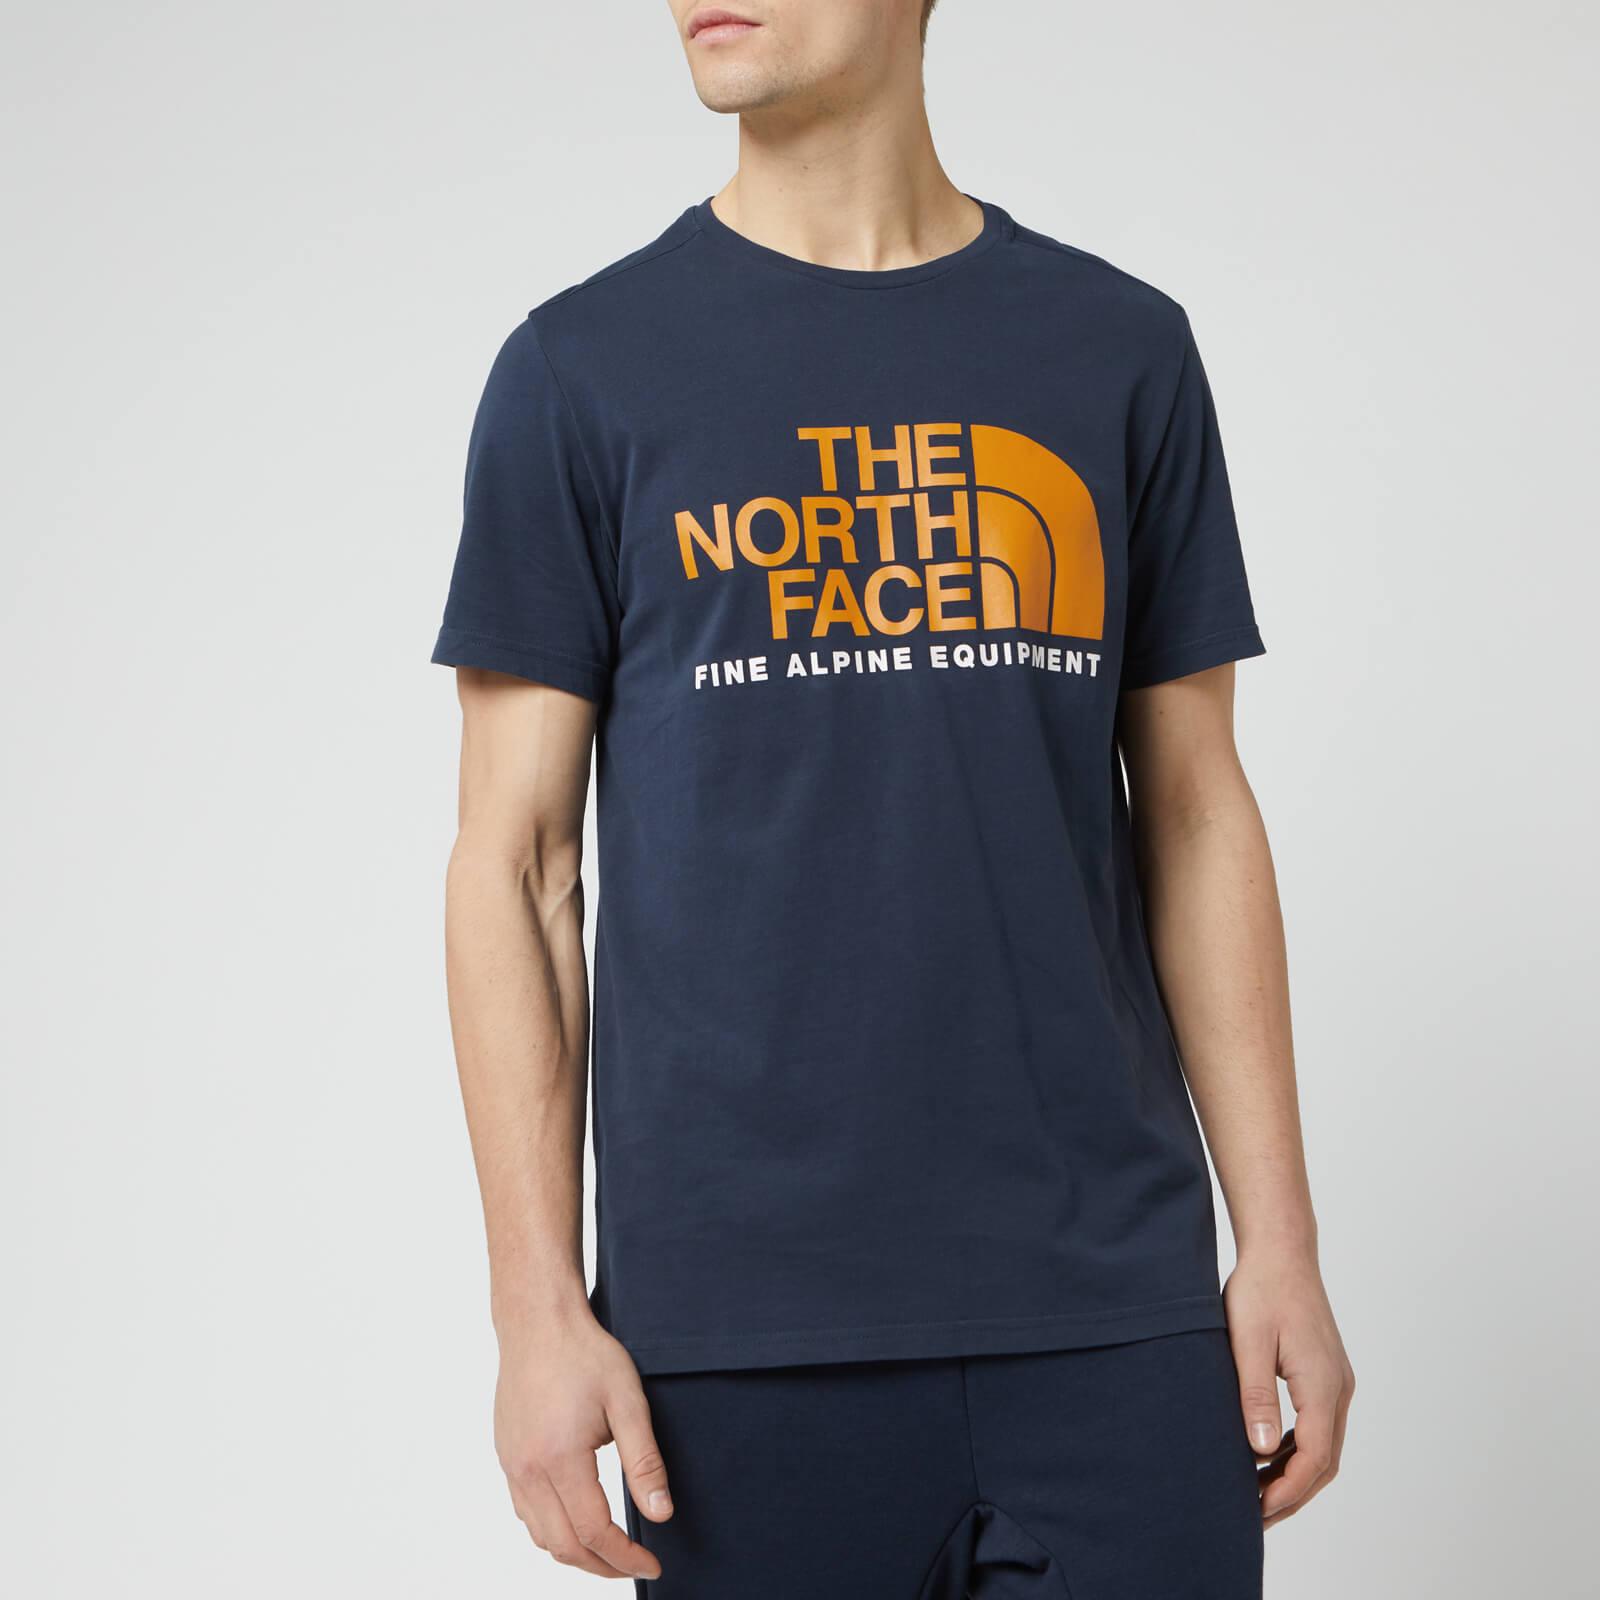 49ce2c1d9 The North Face Men's Fine Alpine Short Sleeve T-Shirt - Urban Navy